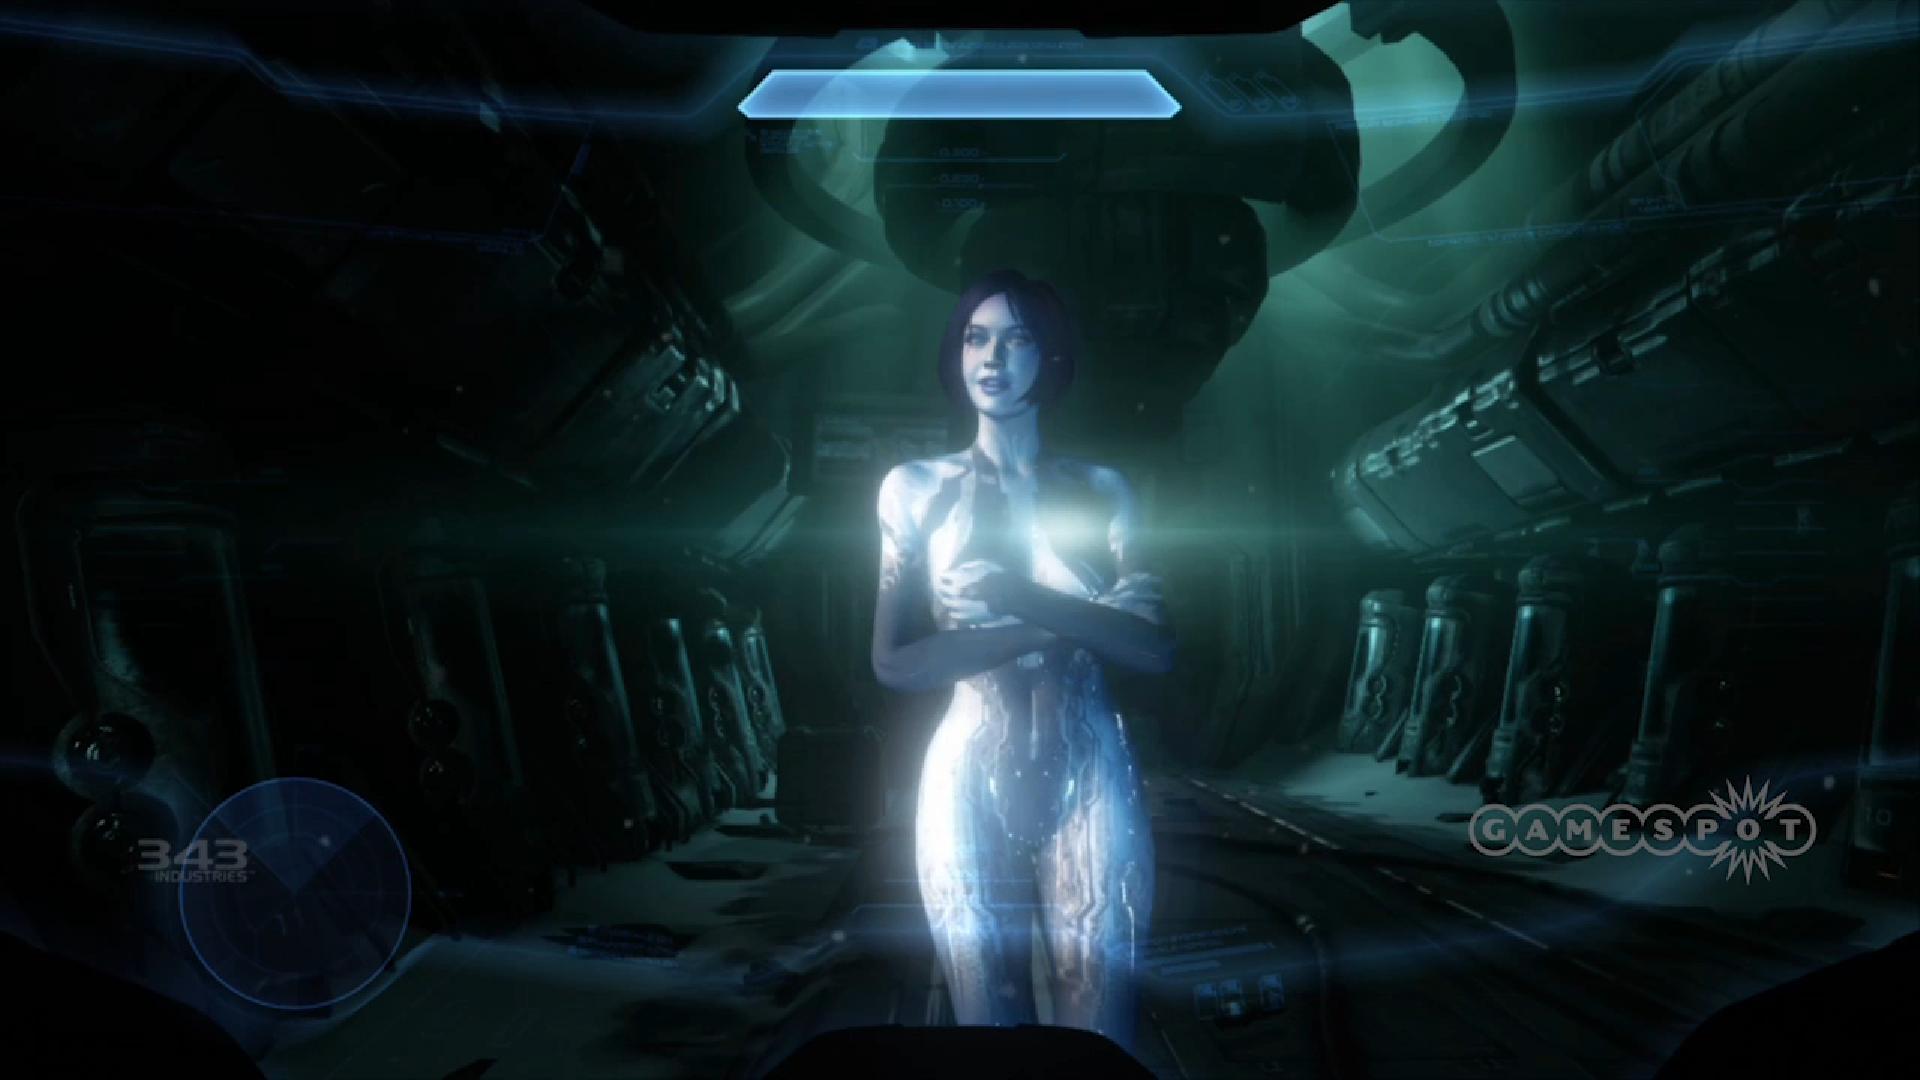 Cortana S Face From Halo 4 Looks Similar To Legacy Halo